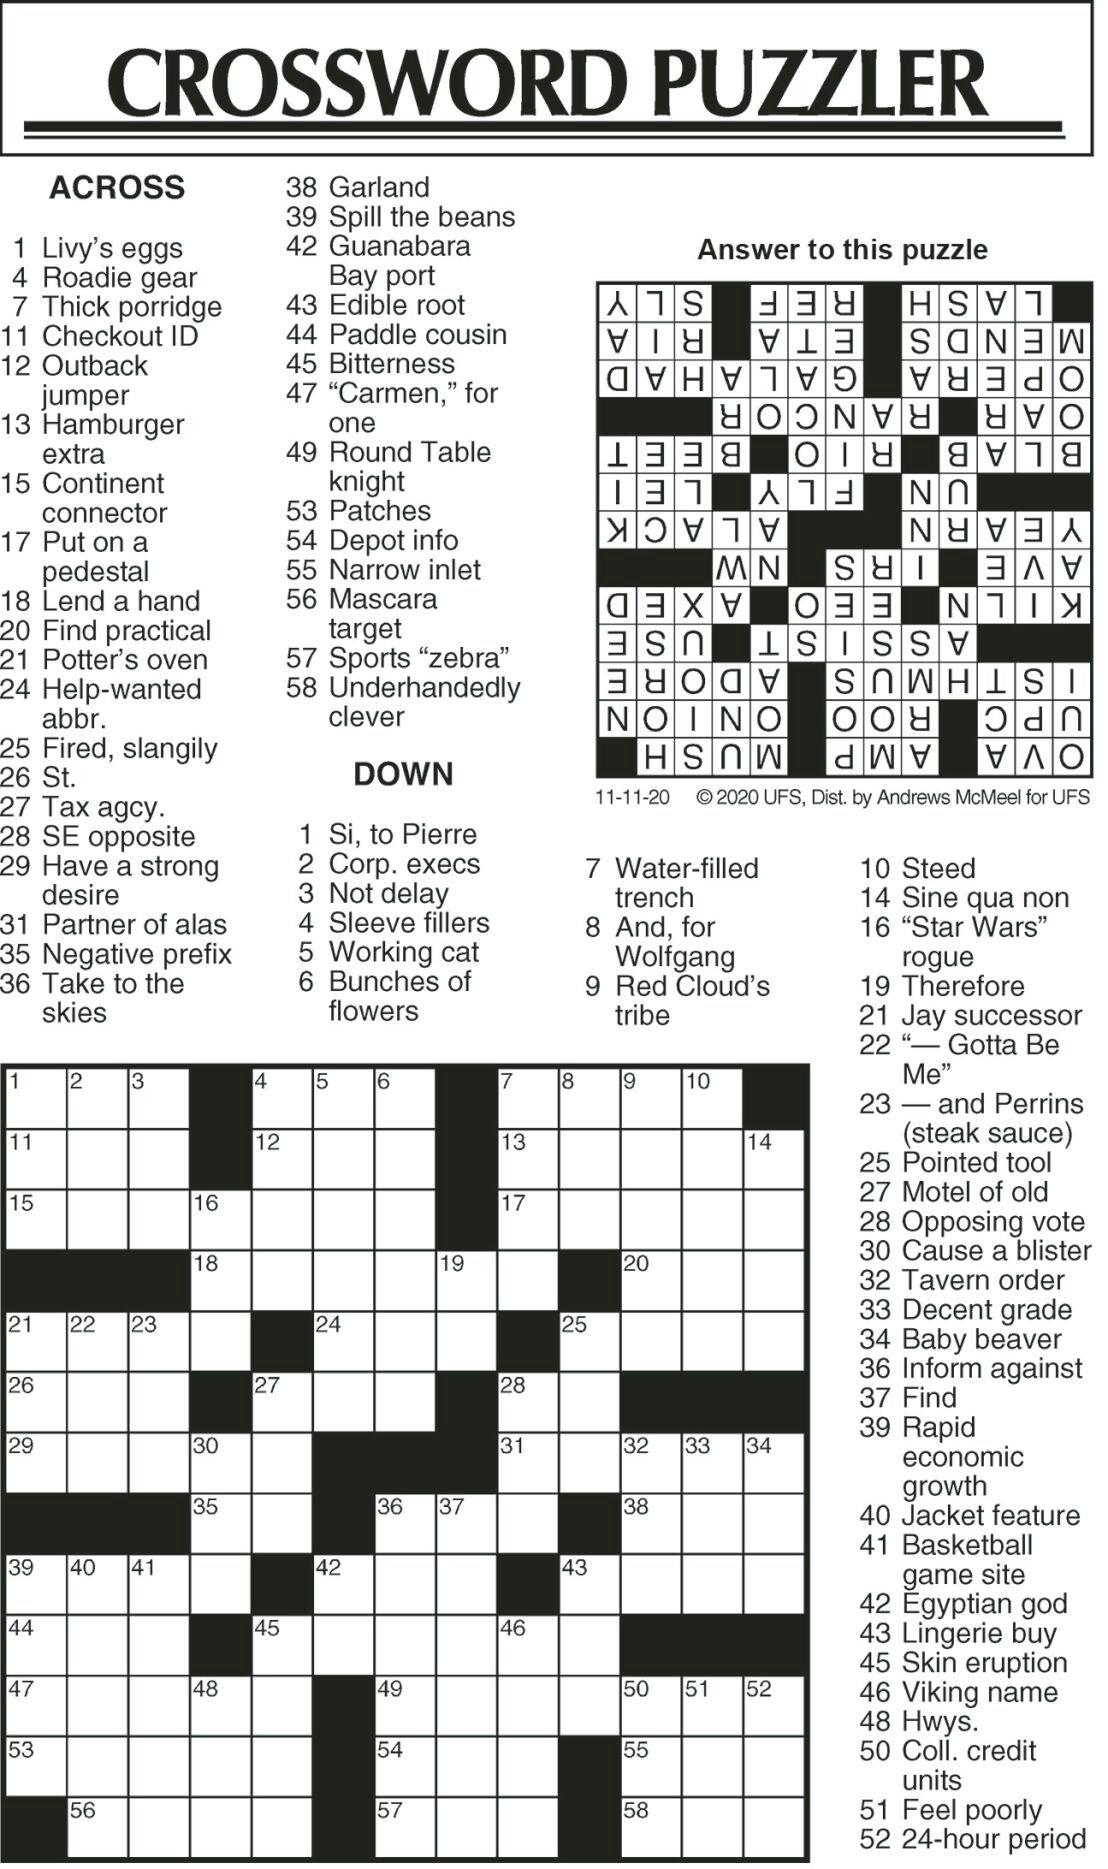 Crossword Puzzle JPG 111120